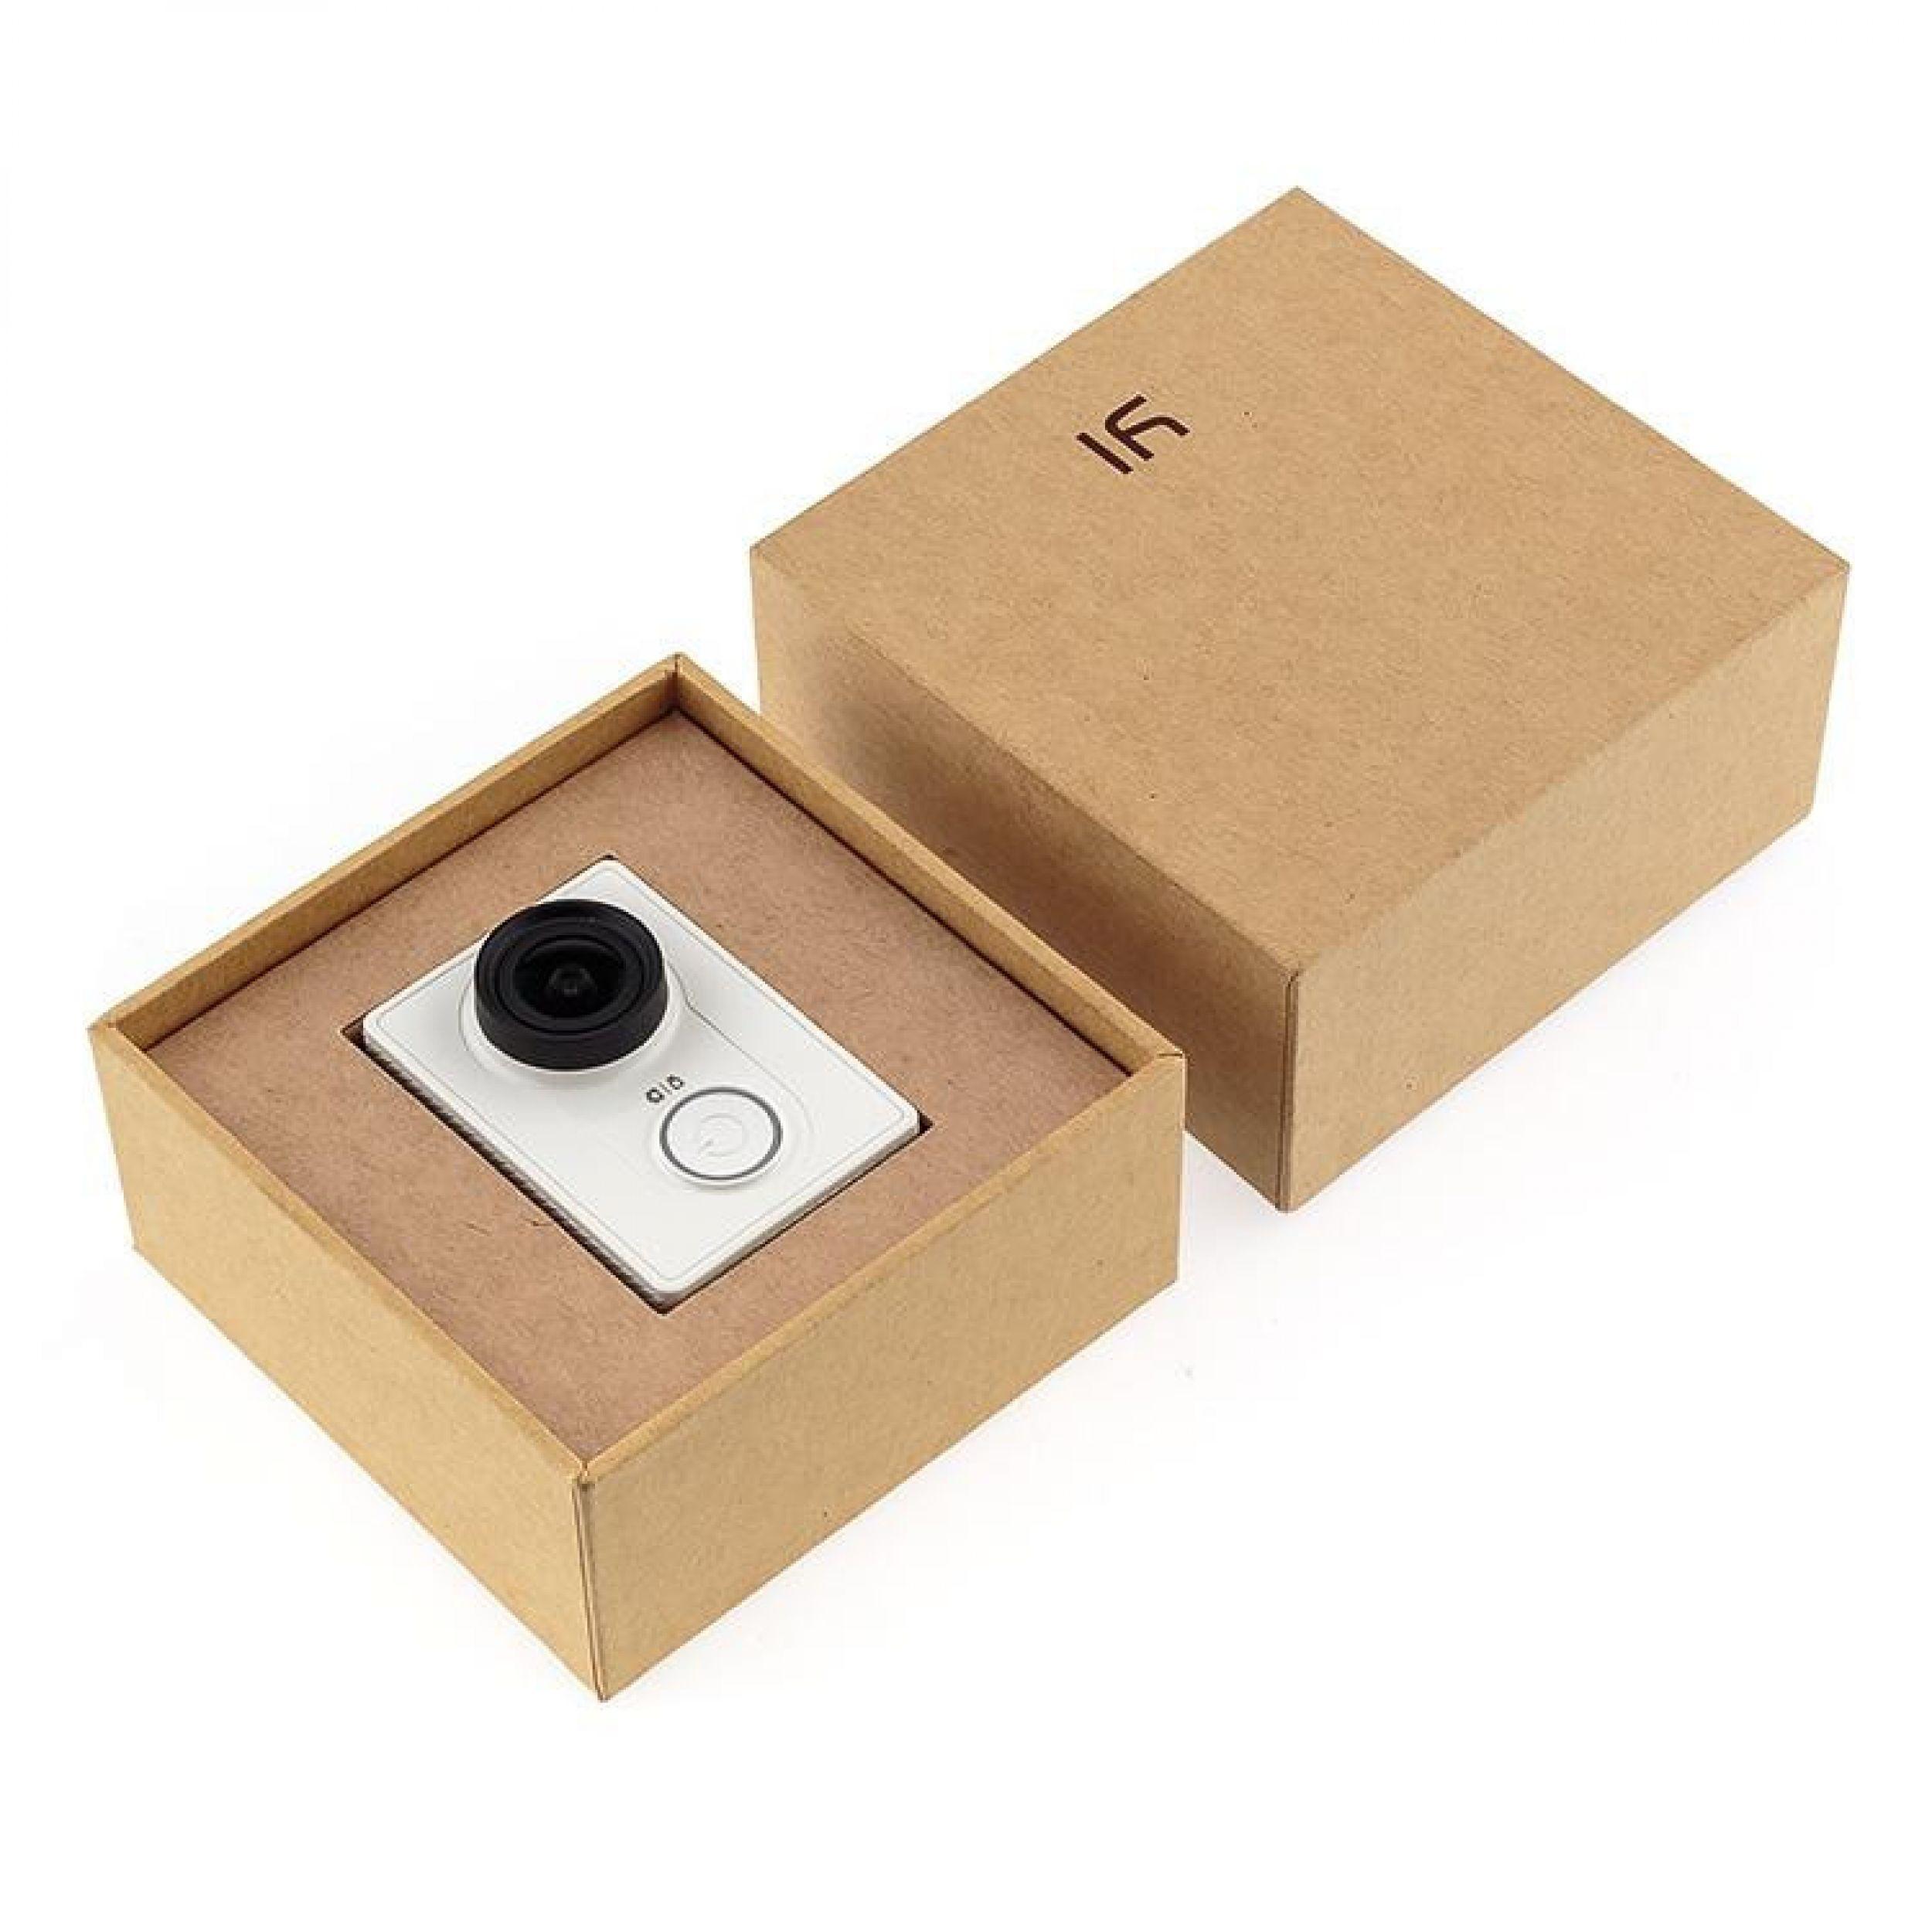 In-Stock-Xiaomi-Yi-Camera-1080p-Bluetooth.jpg